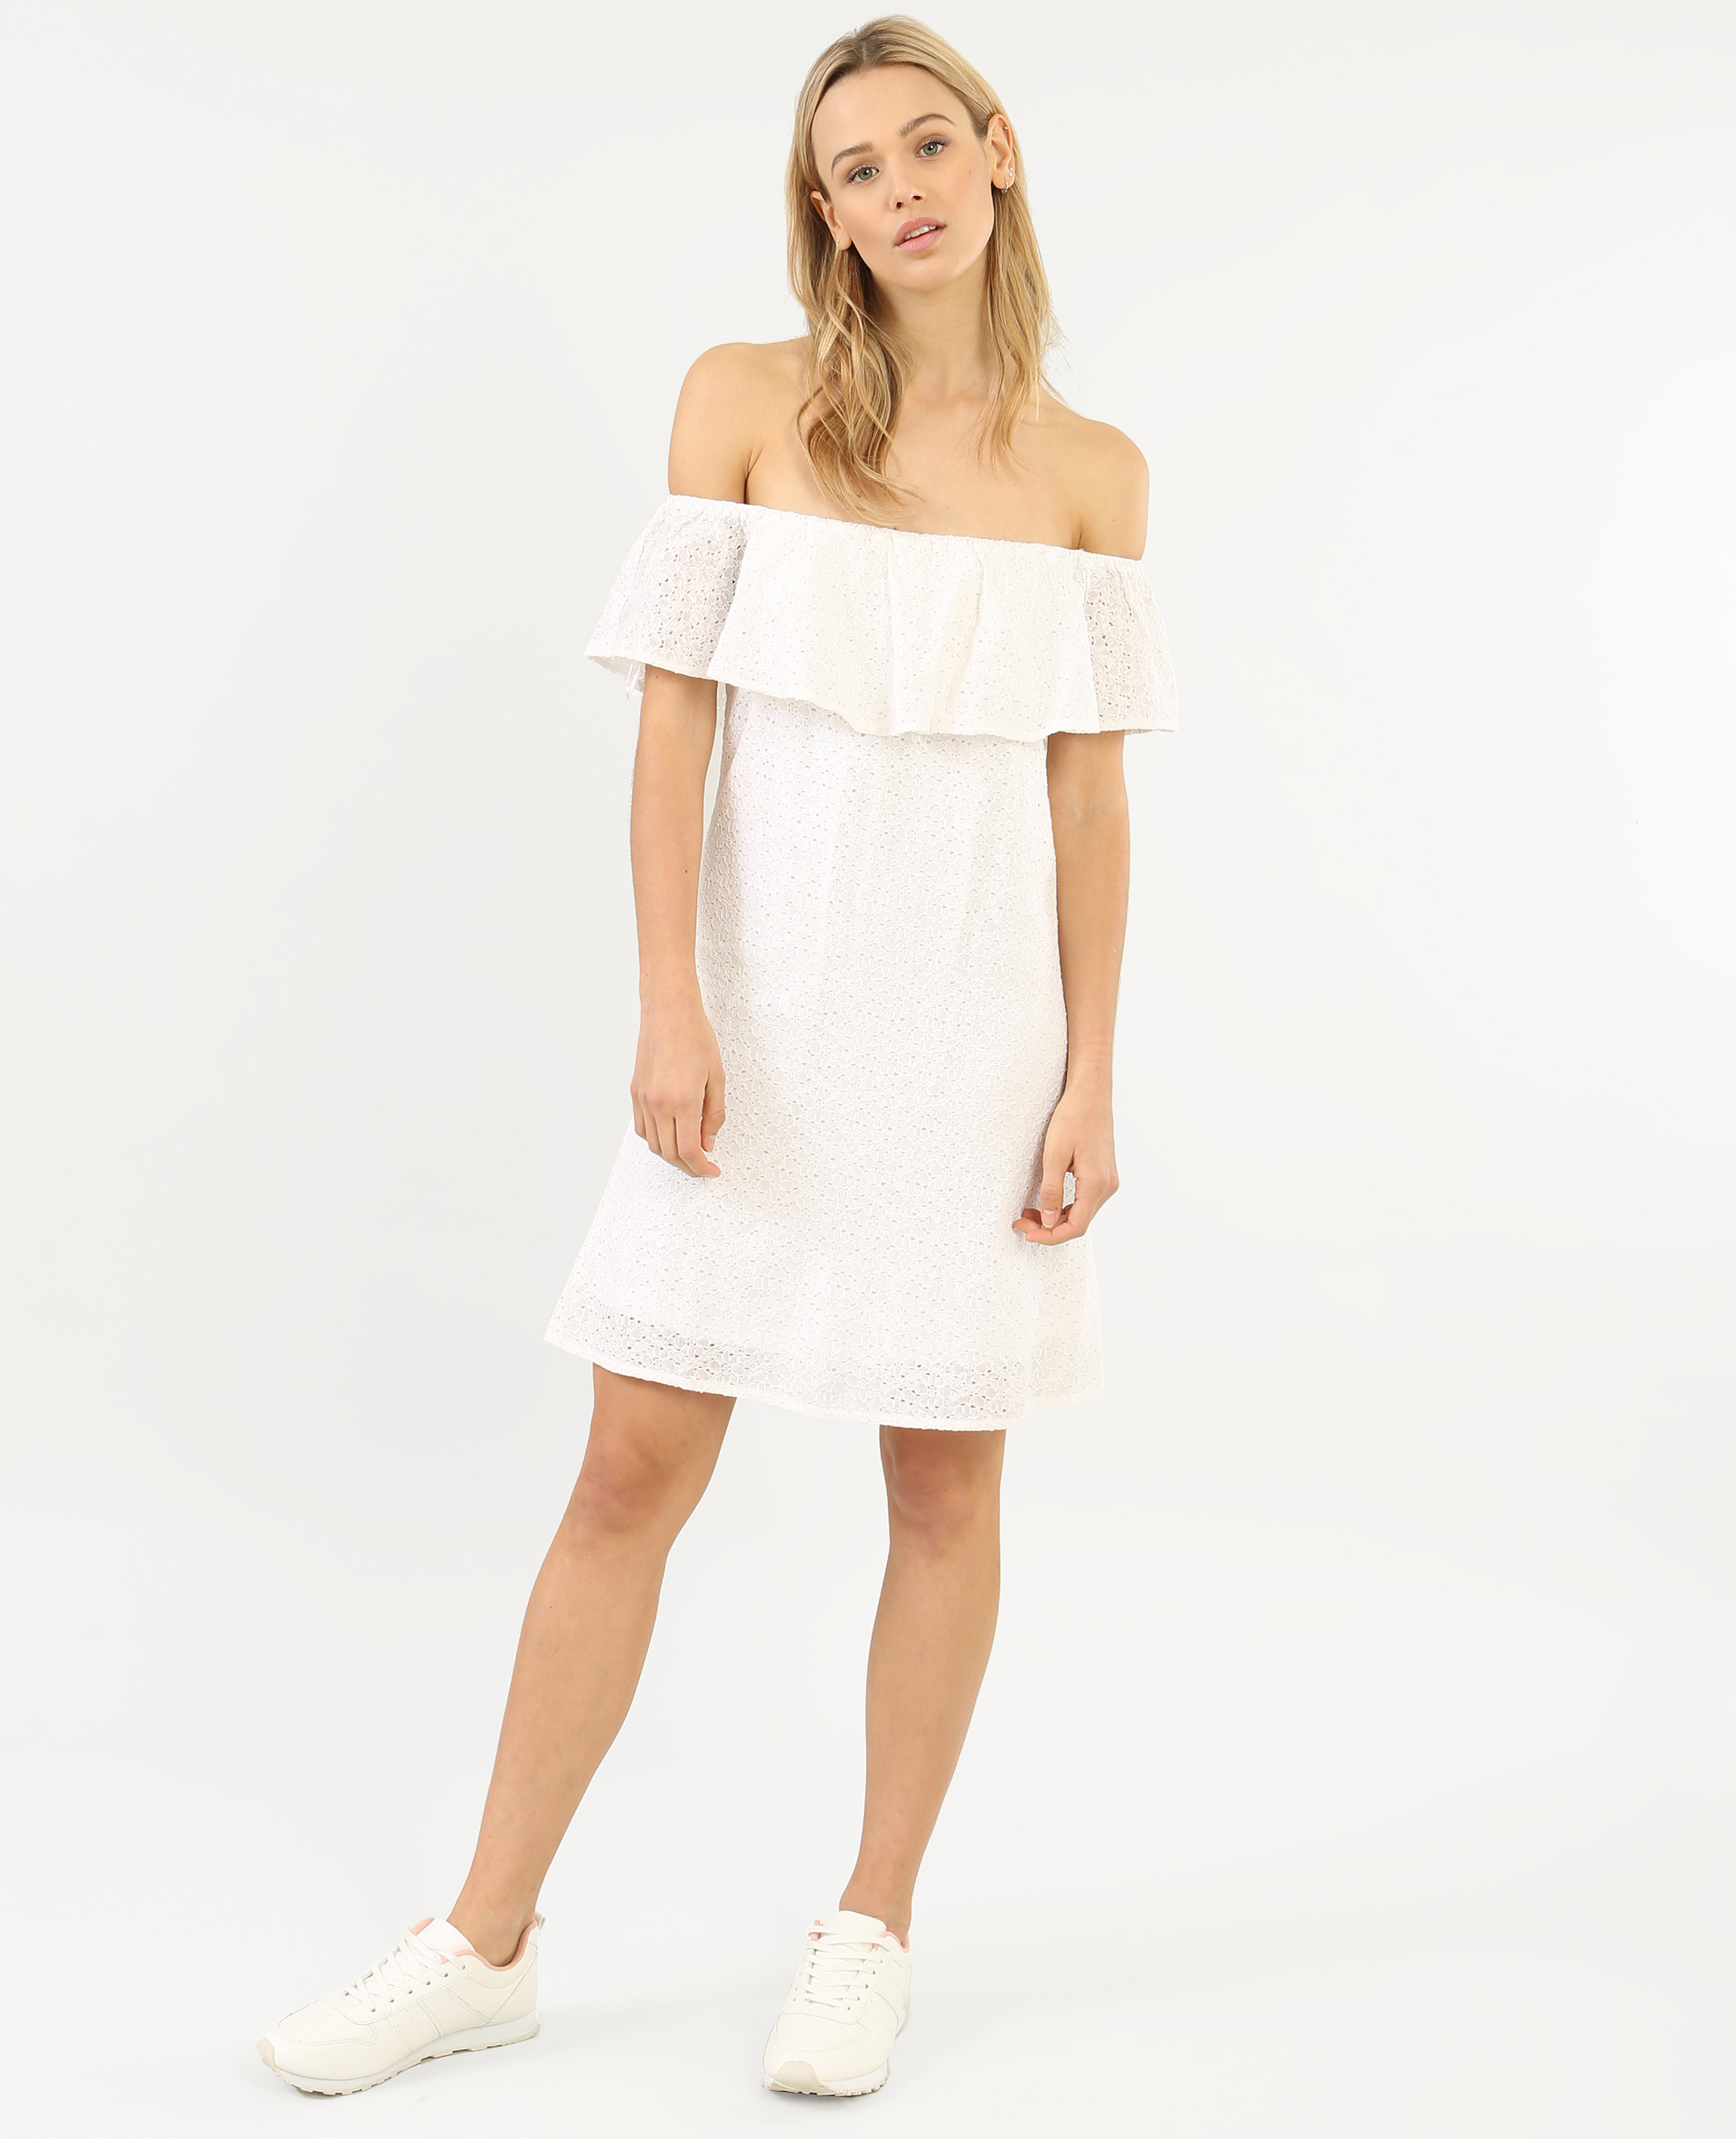 robe dentelle col bardot blanc cass 780598912a09 pimkie. Black Bedroom Furniture Sets. Home Design Ideas